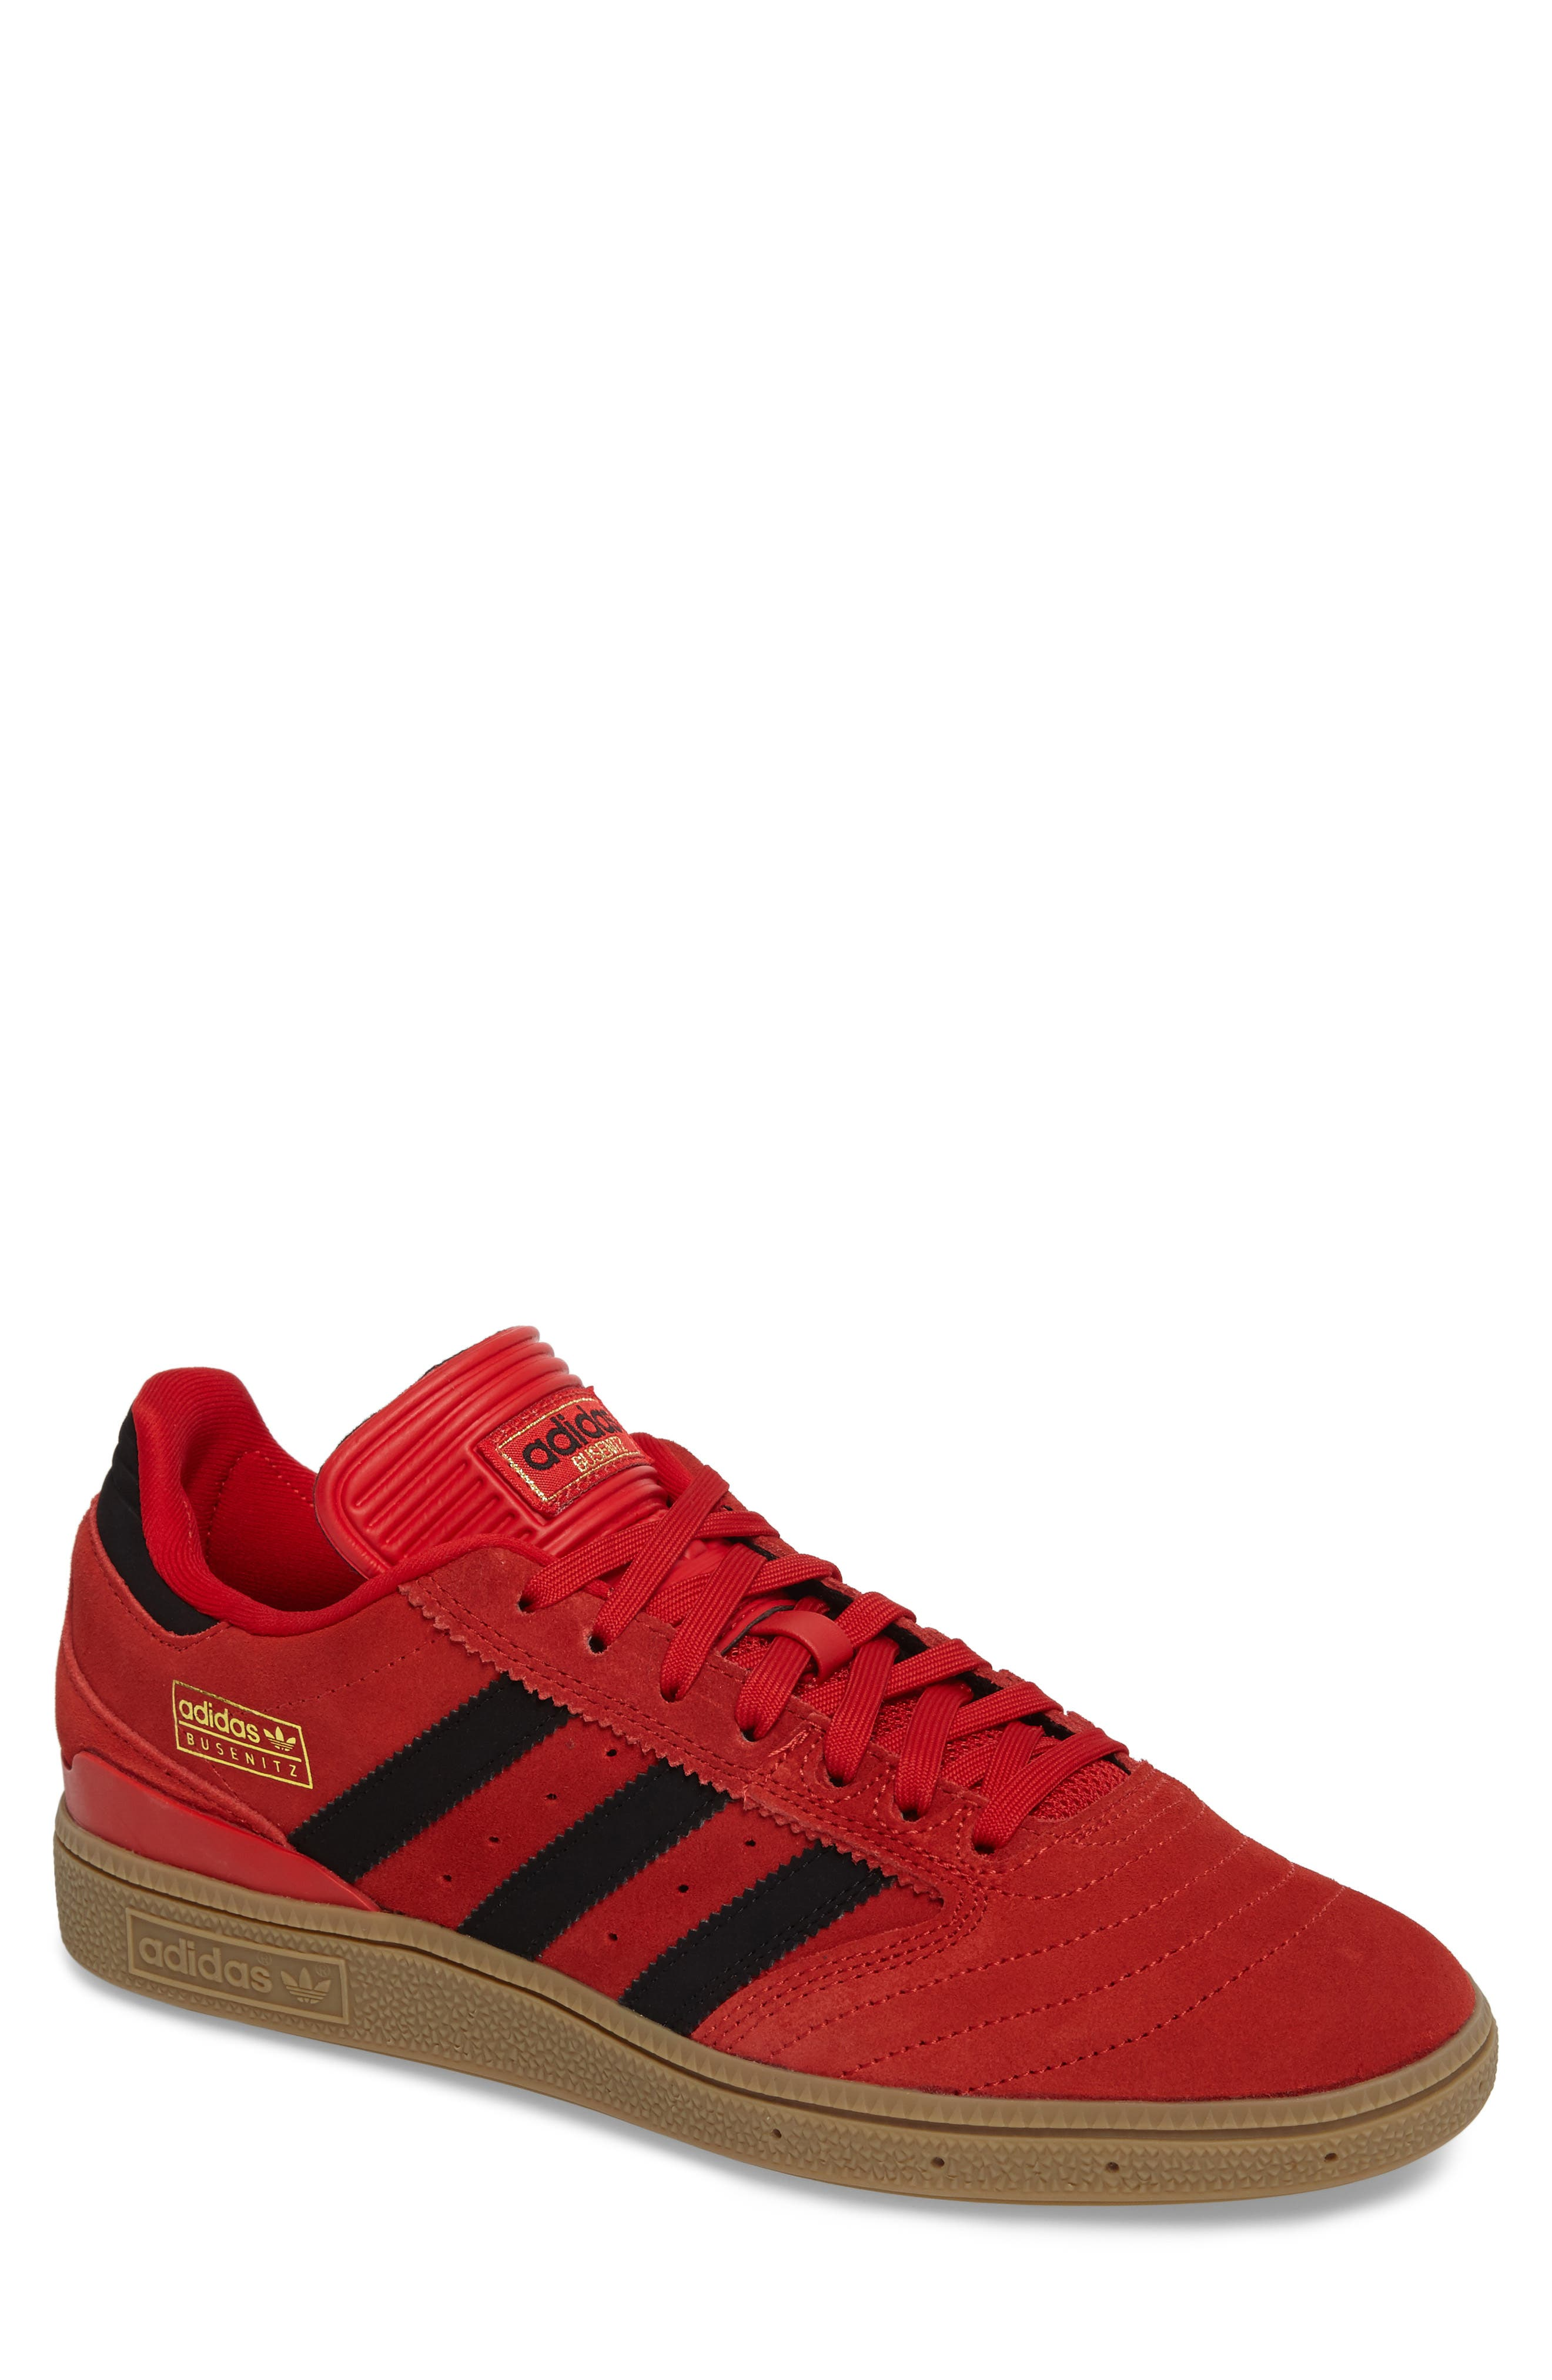 Alternate Image 1 Selected - adidas Busenitz Sneaker (Men)